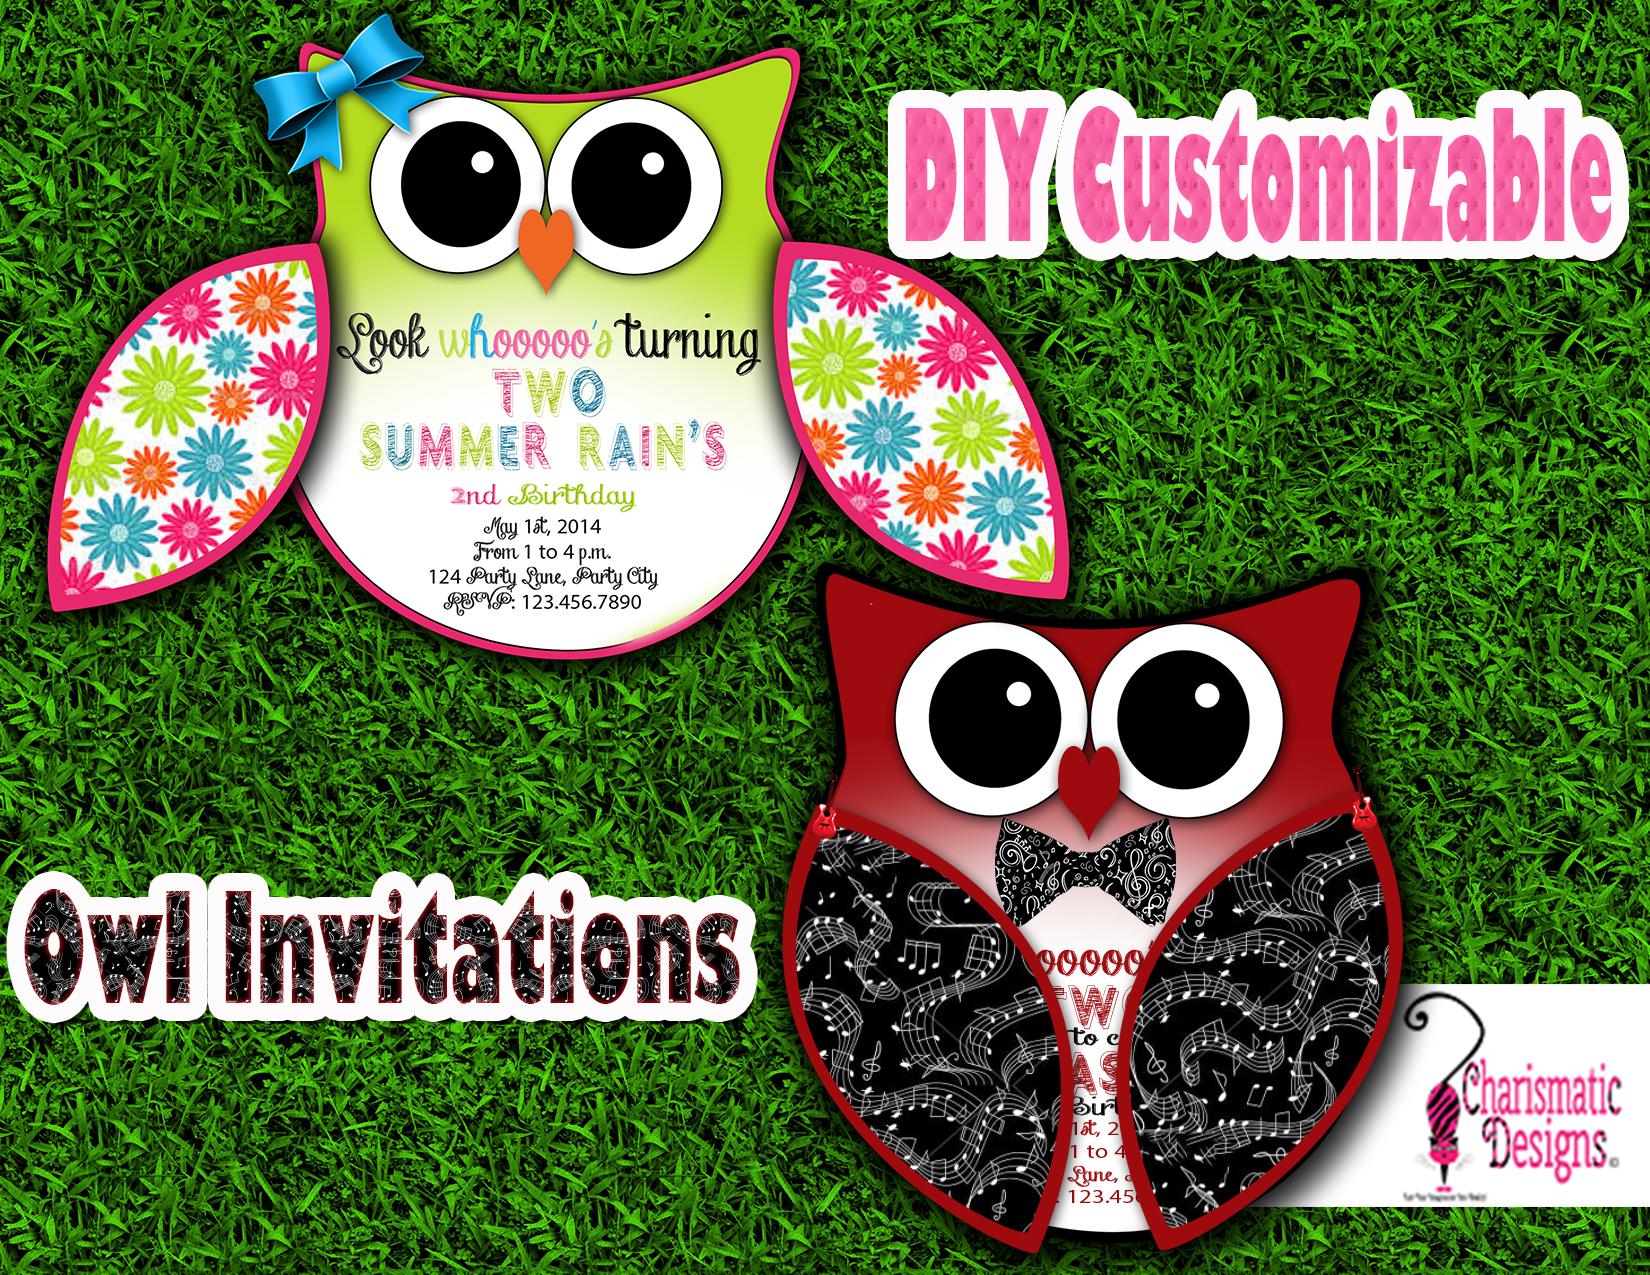 Free DIY Customizable Owl Invitation Printable Template On Behance